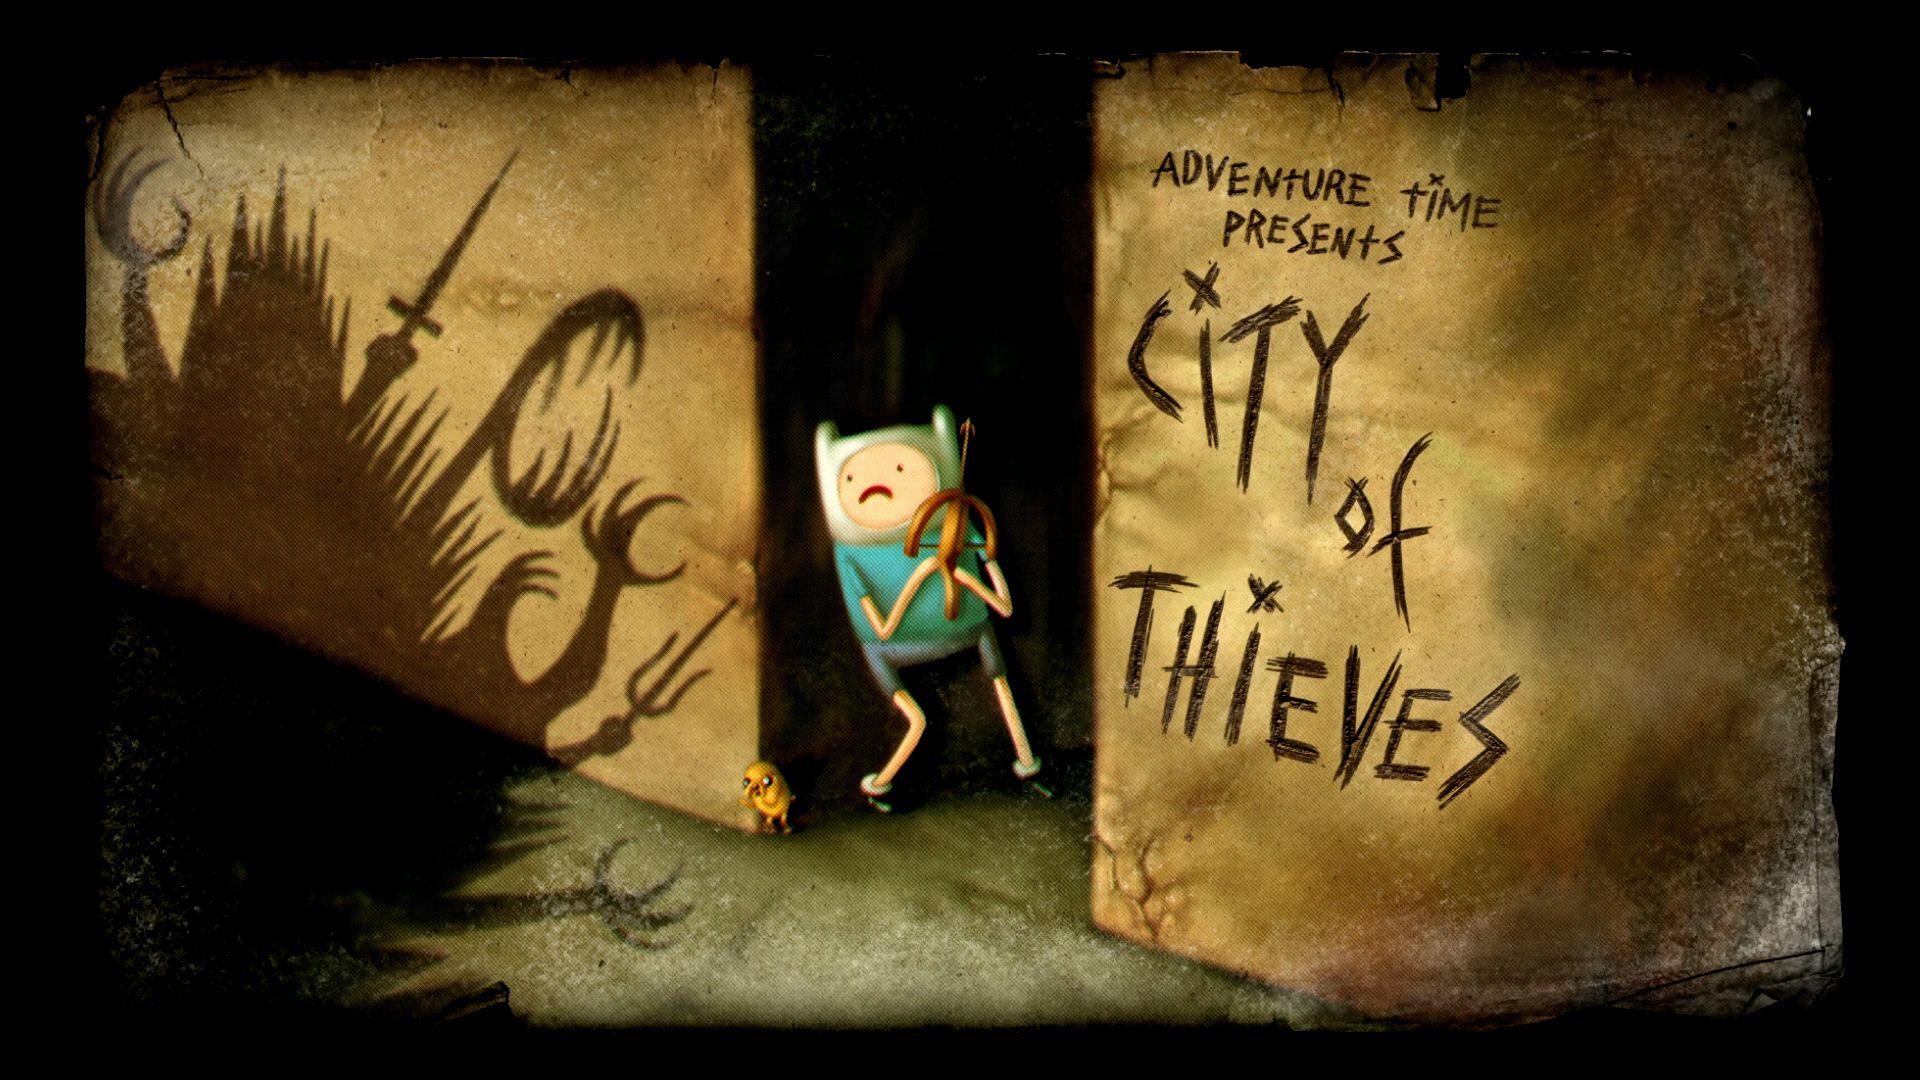 File:Titlecard S1E13 cityofthieves.jpg